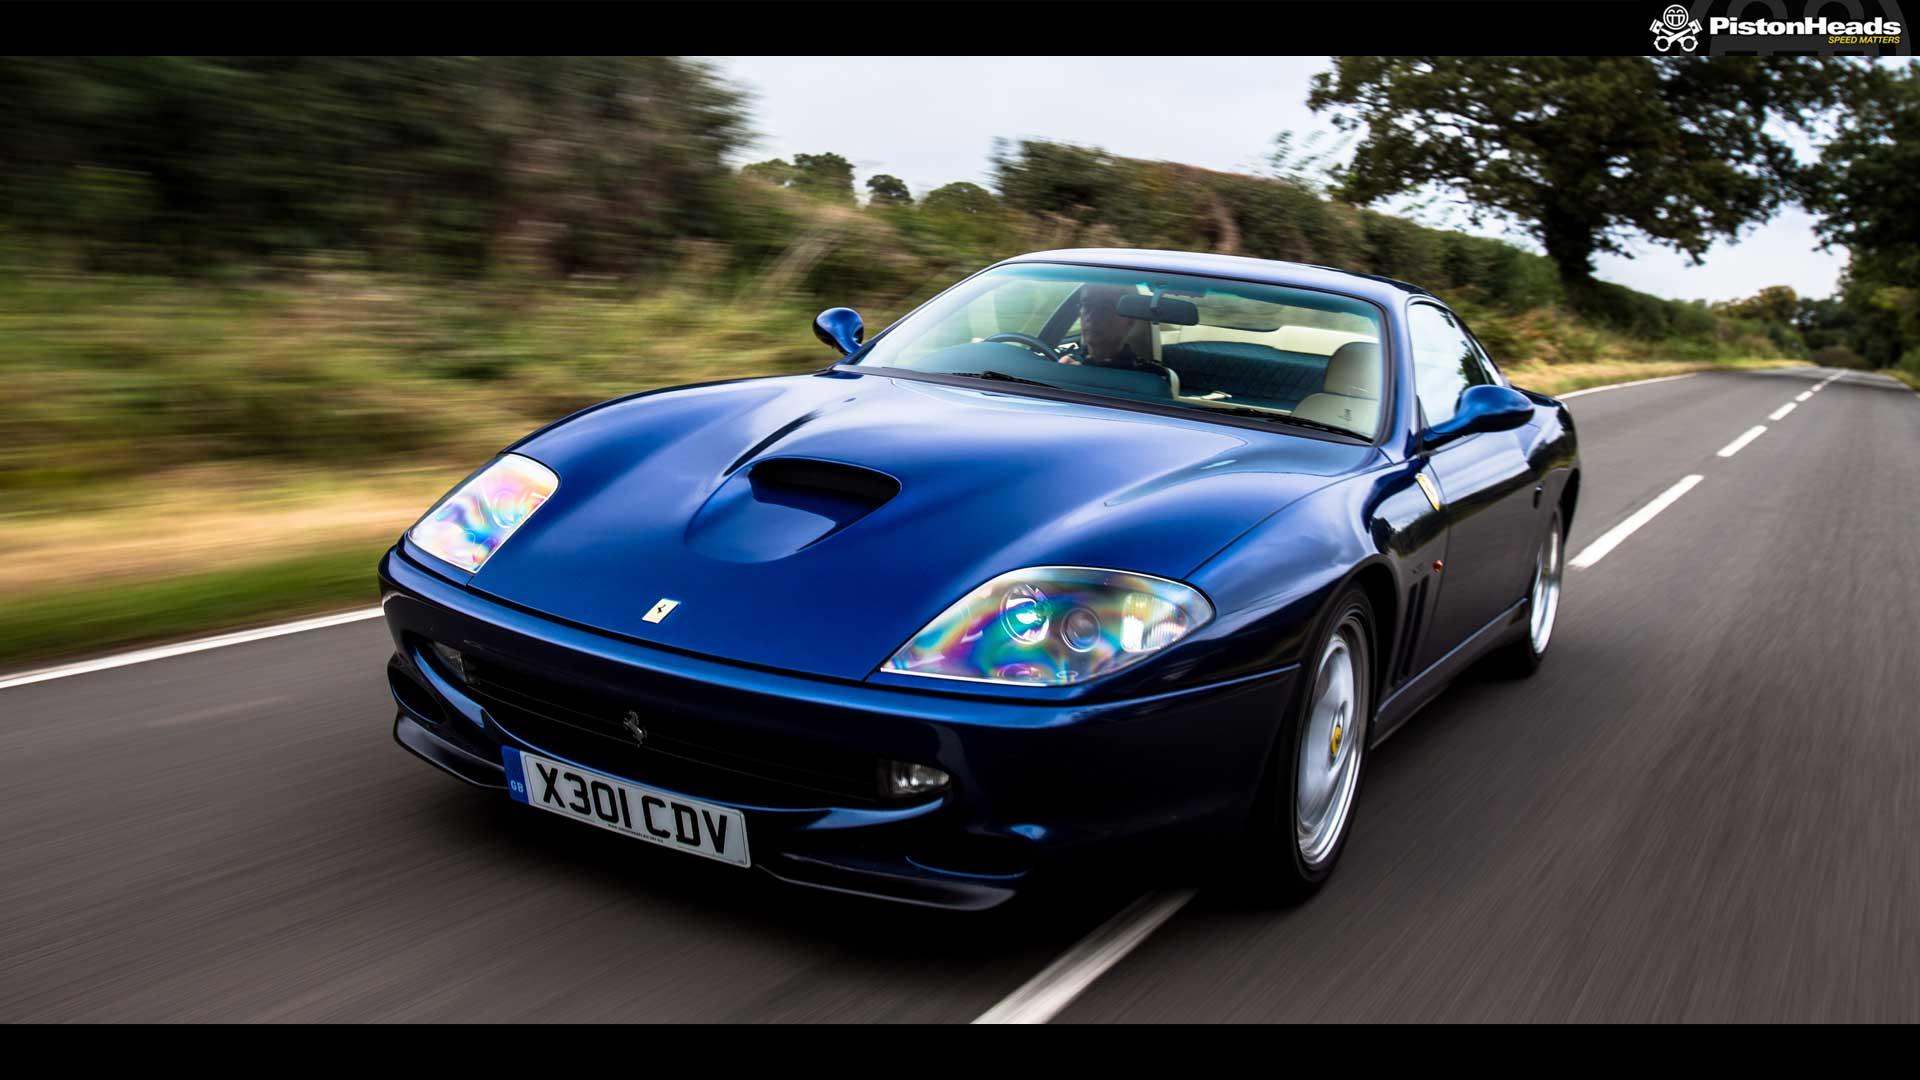 Ferrari 575 blue viewing gallery